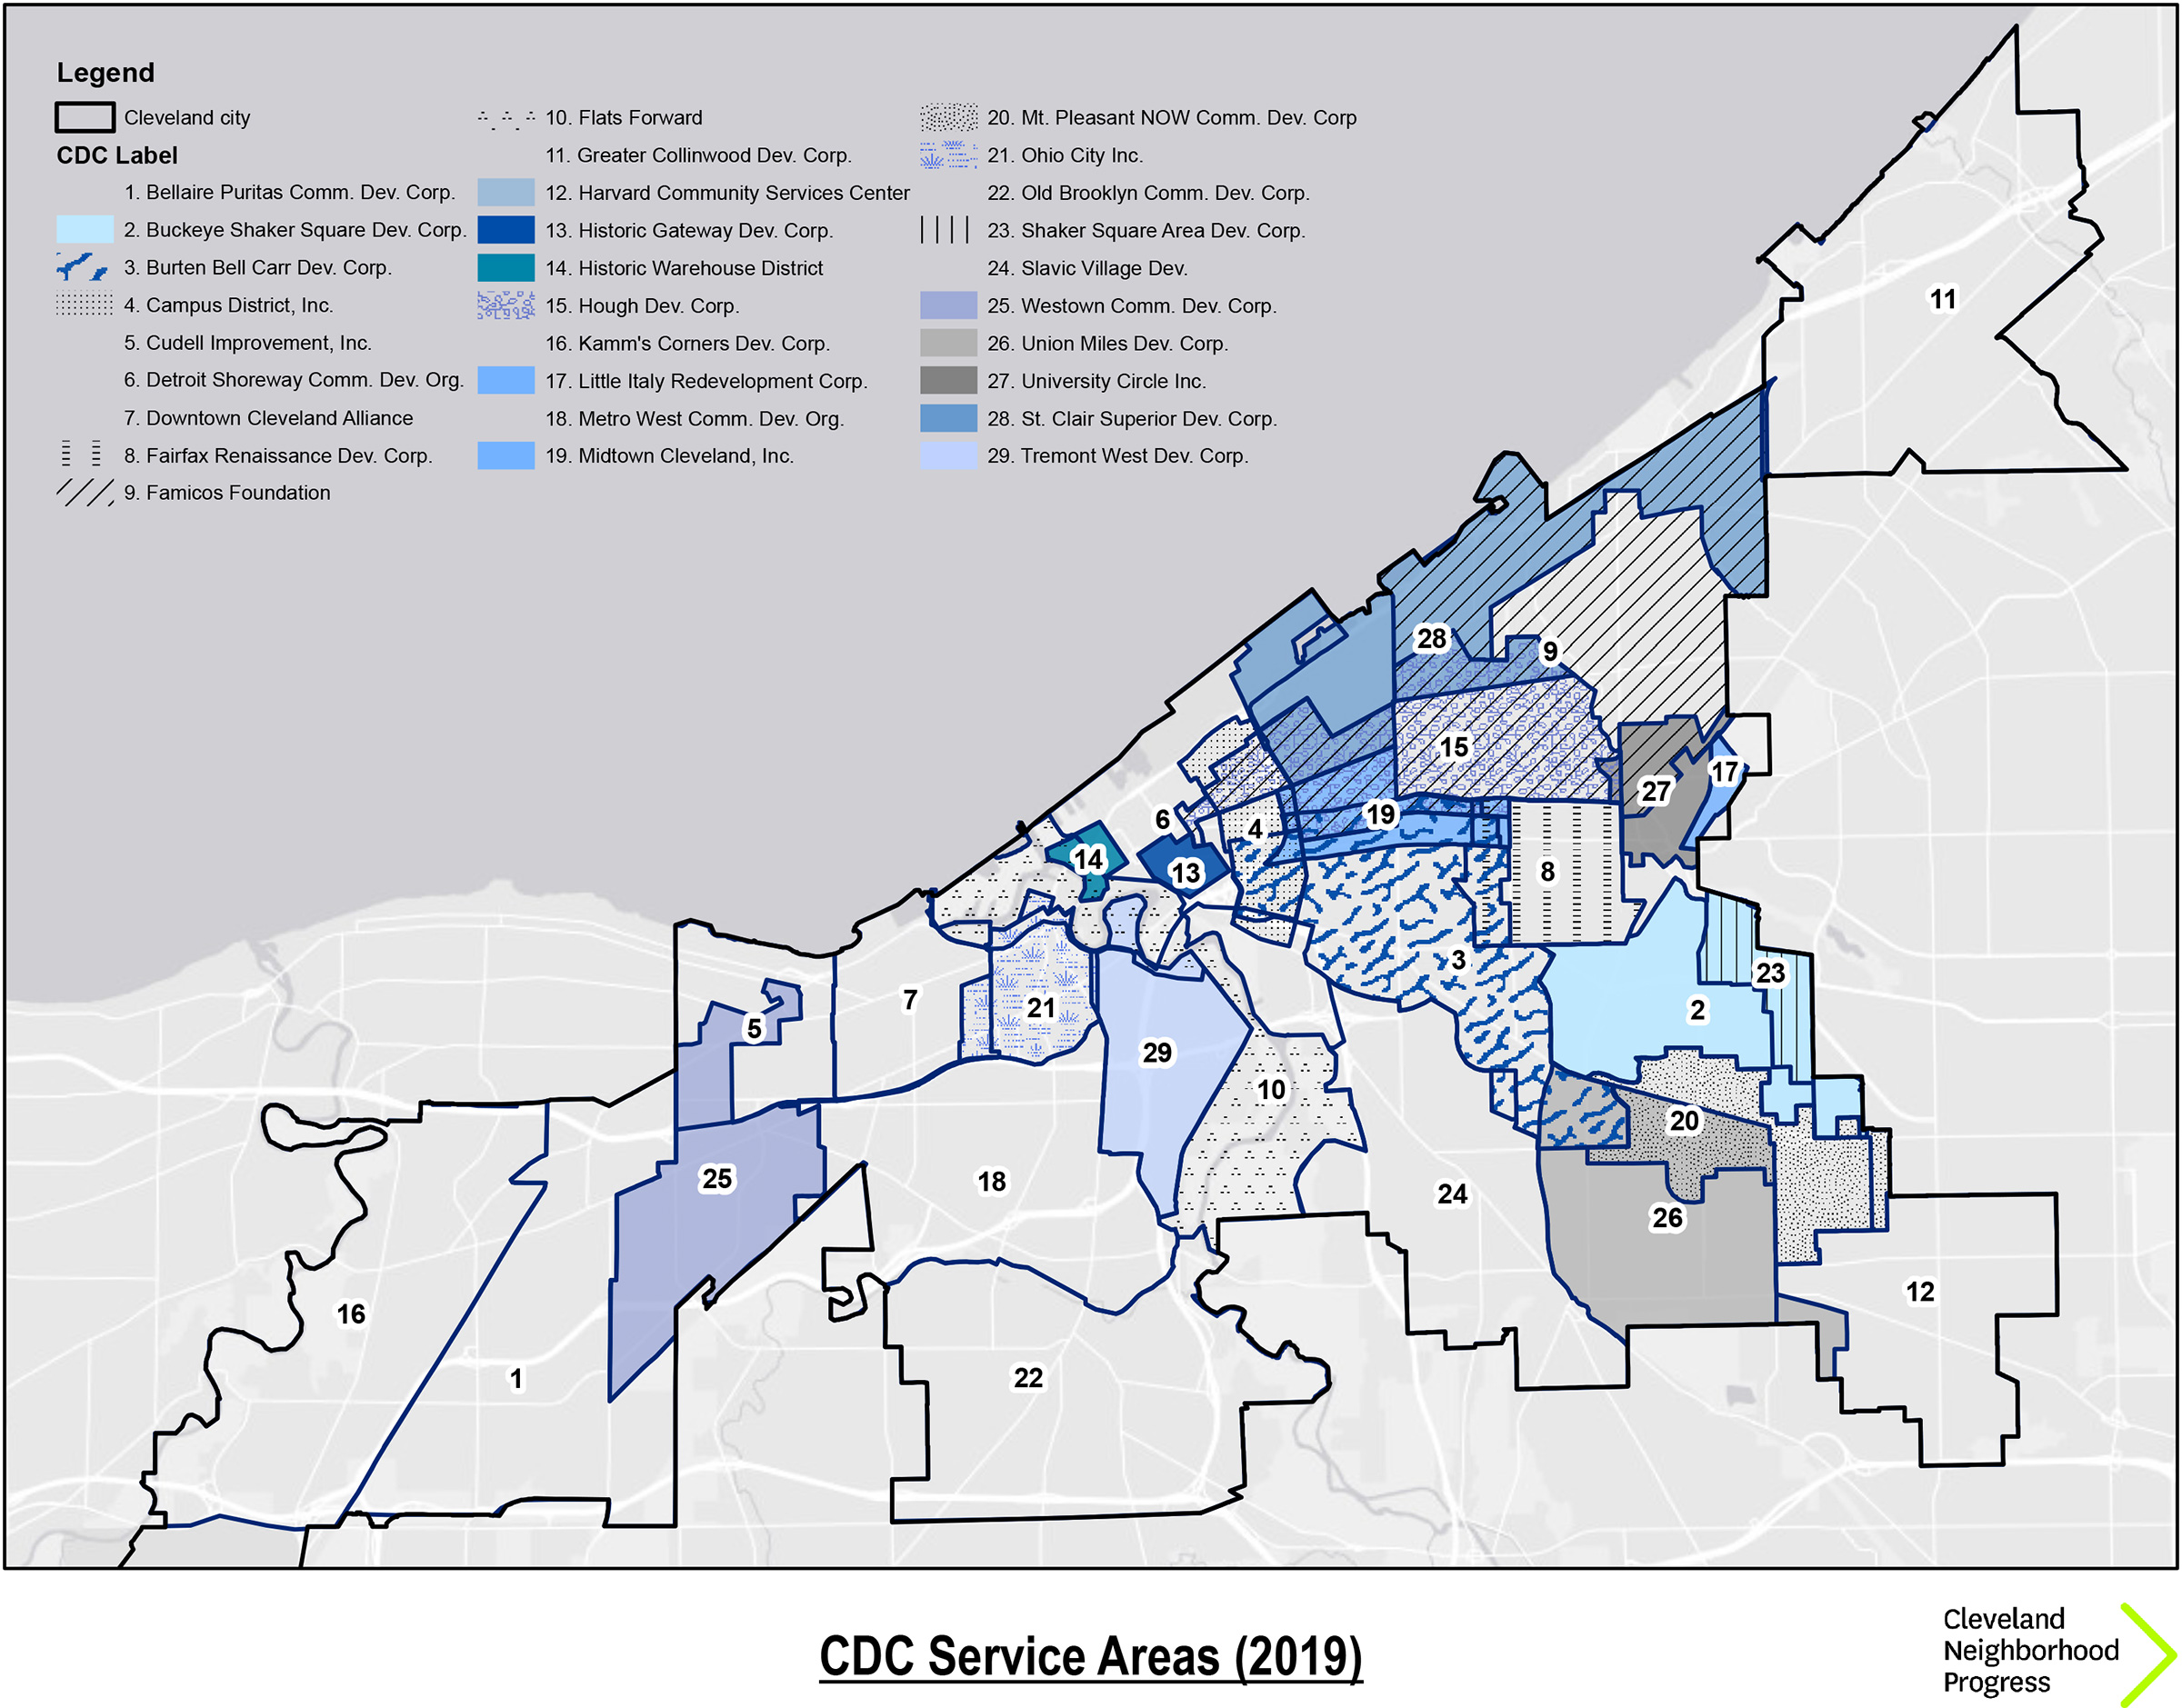 cle-cdcs-map - Cleveland Neighborhood Progress